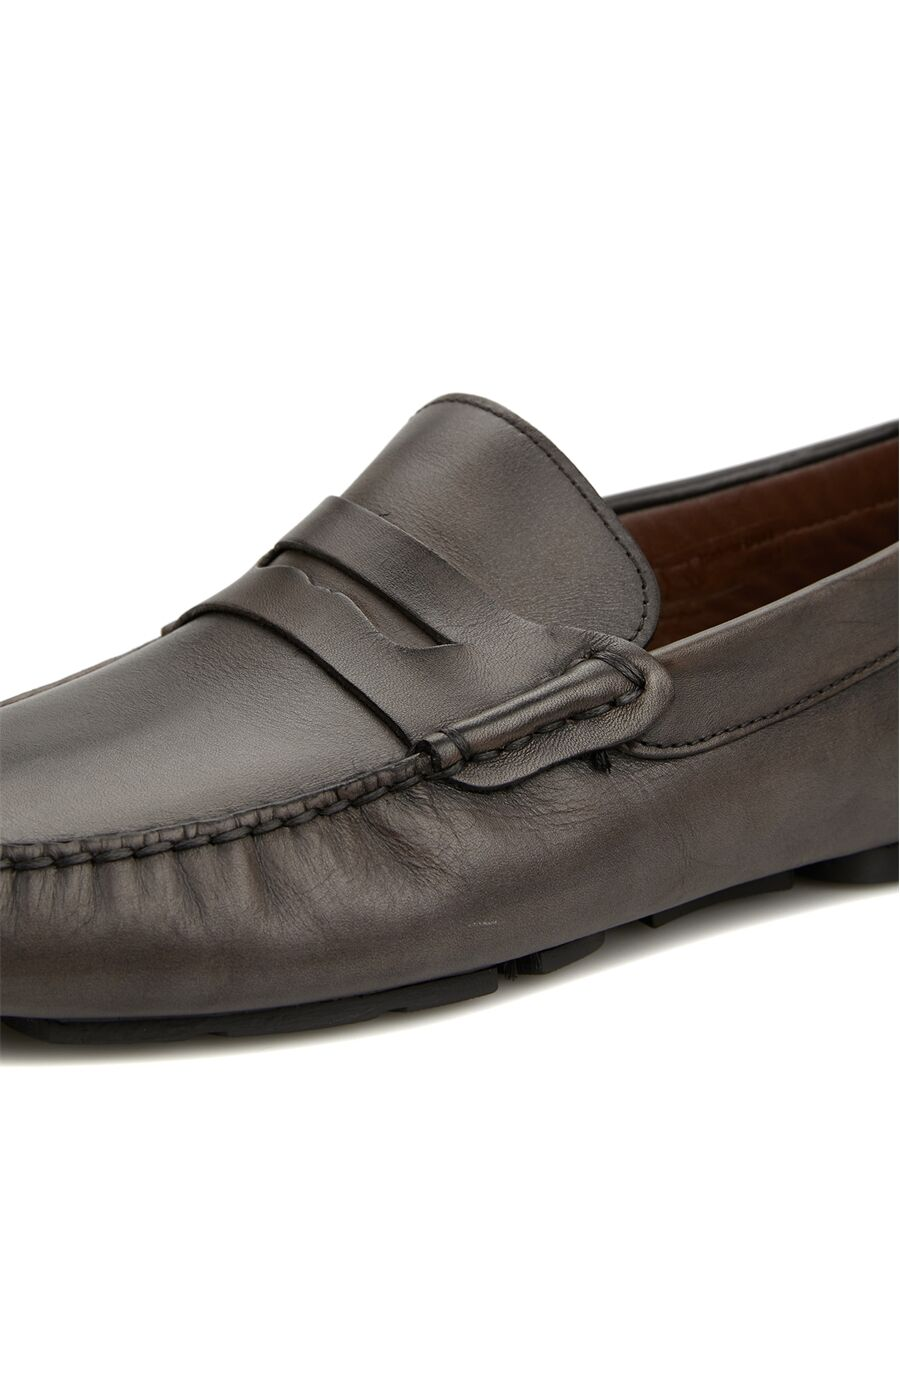 Gri Bant Detaylı Erkek Deri Loafer